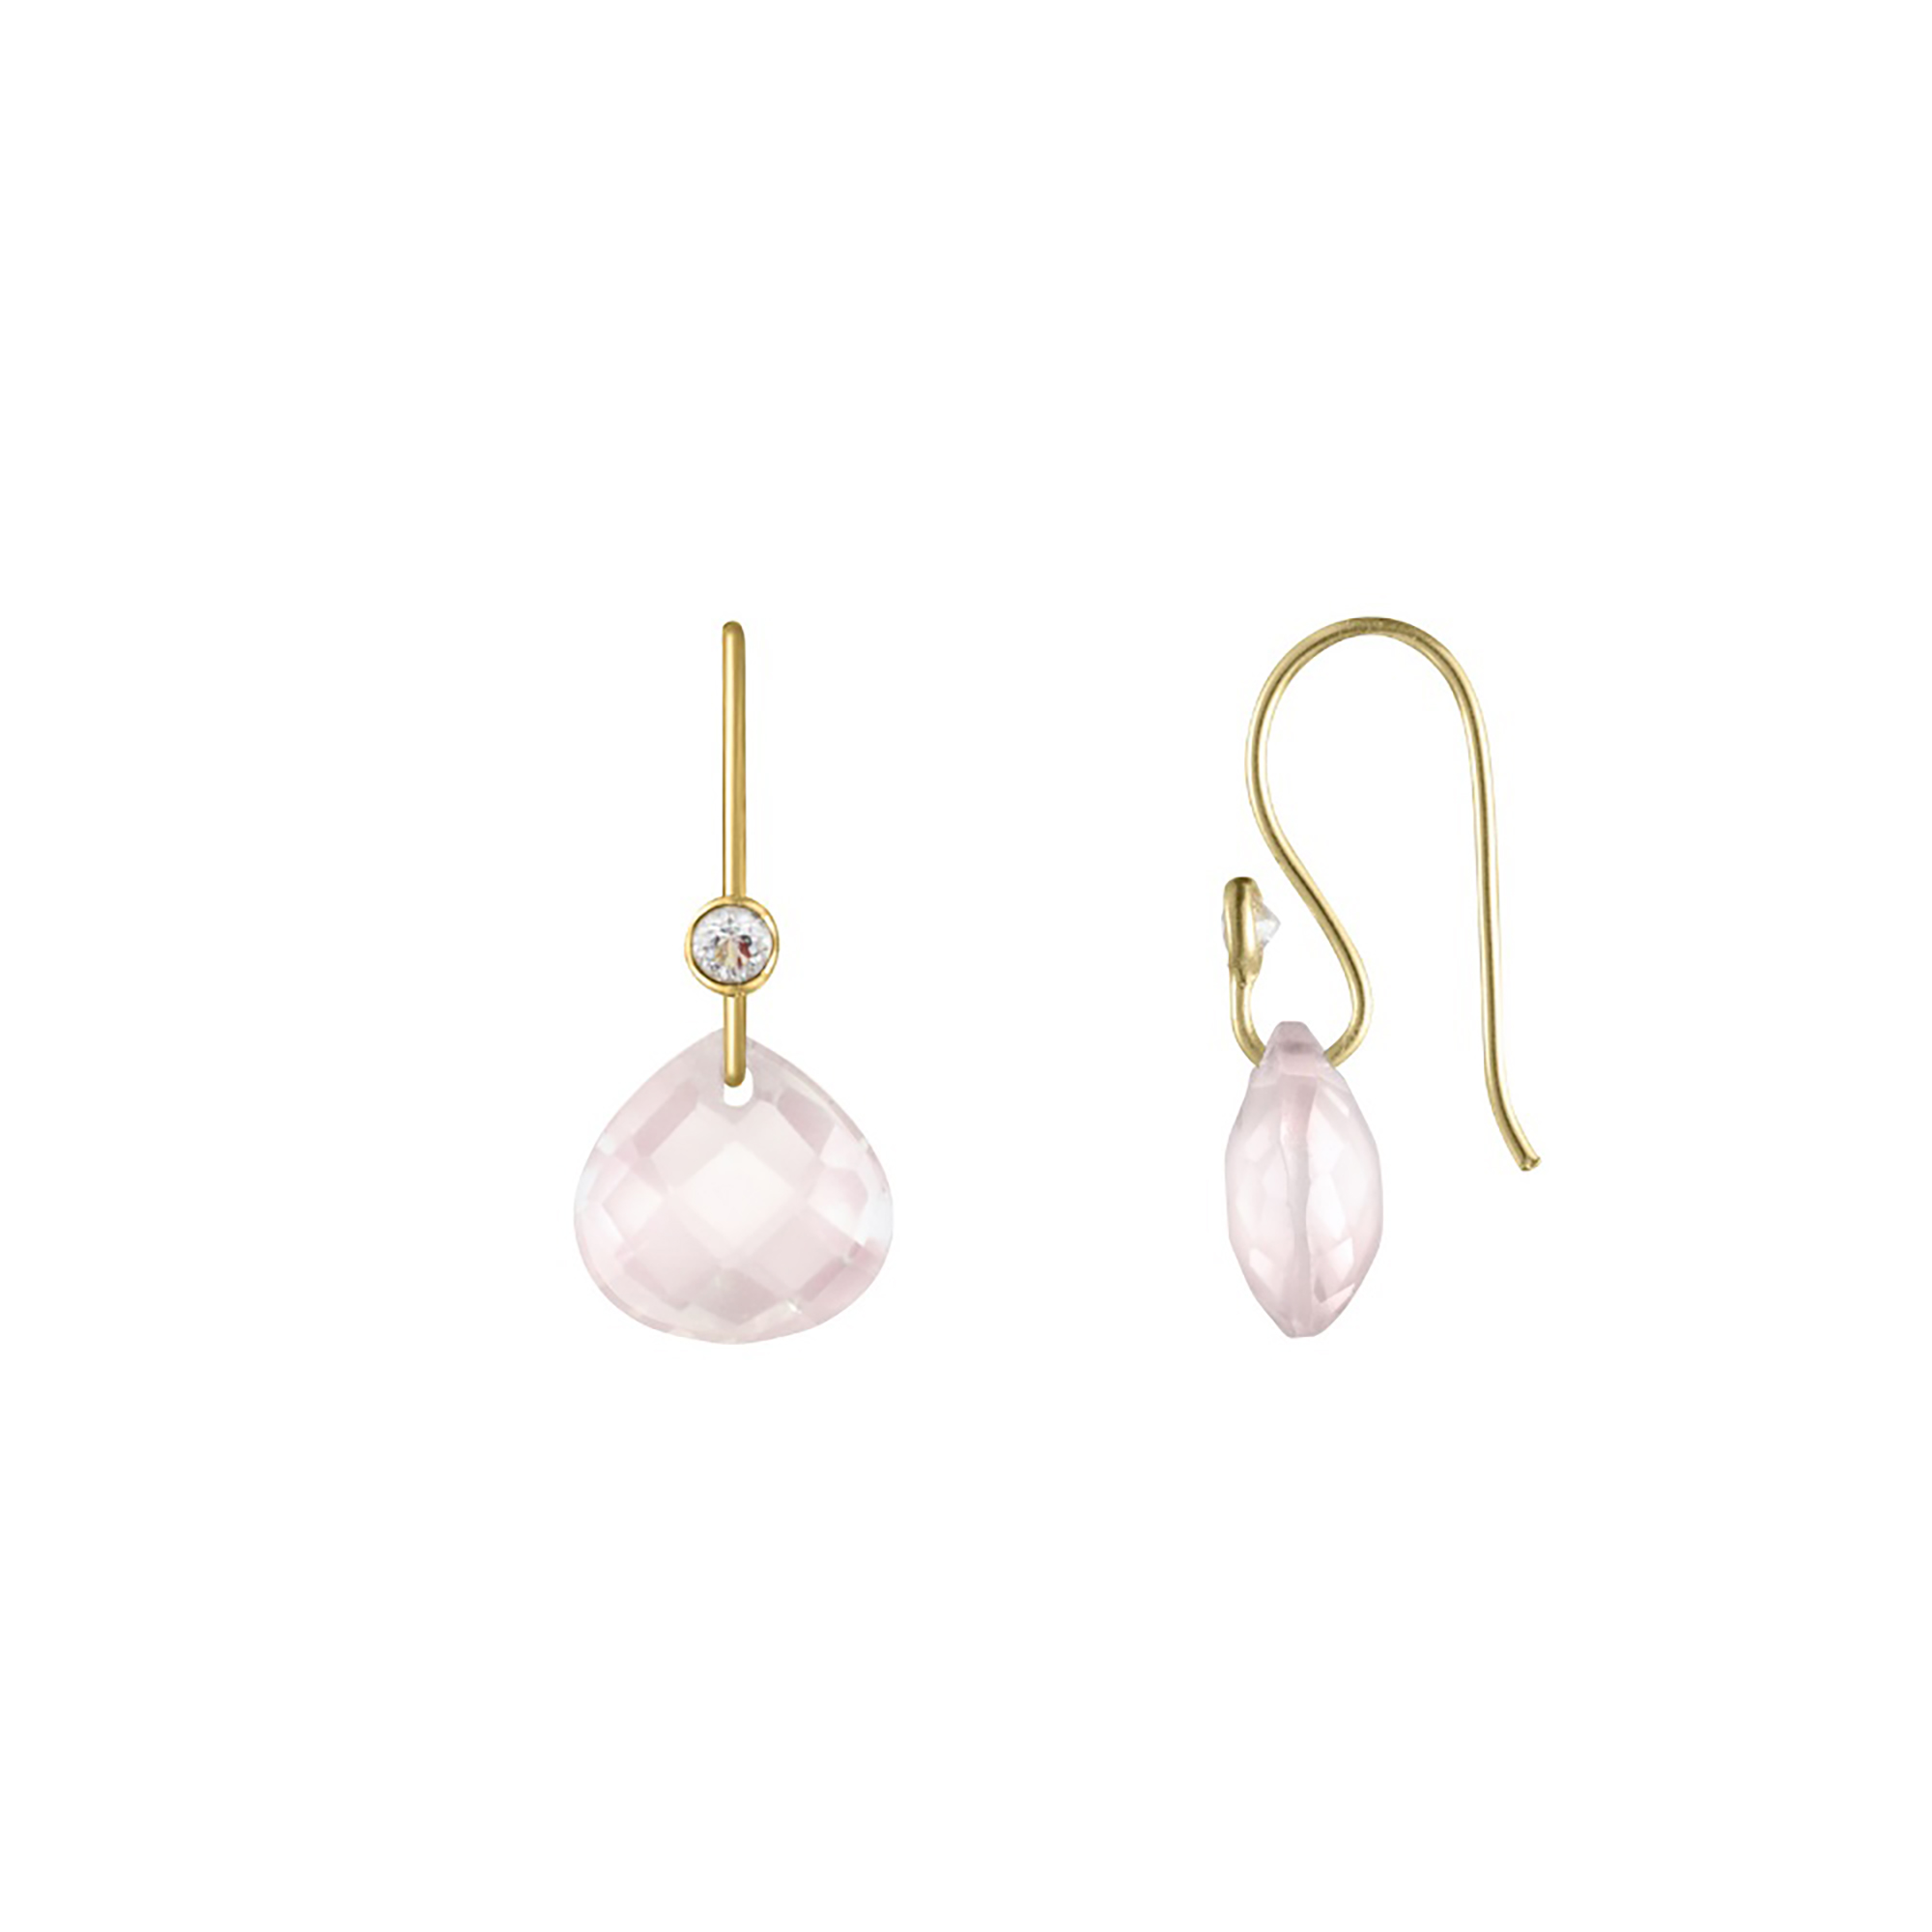 Dew Drop Earrings - Rose Quartz